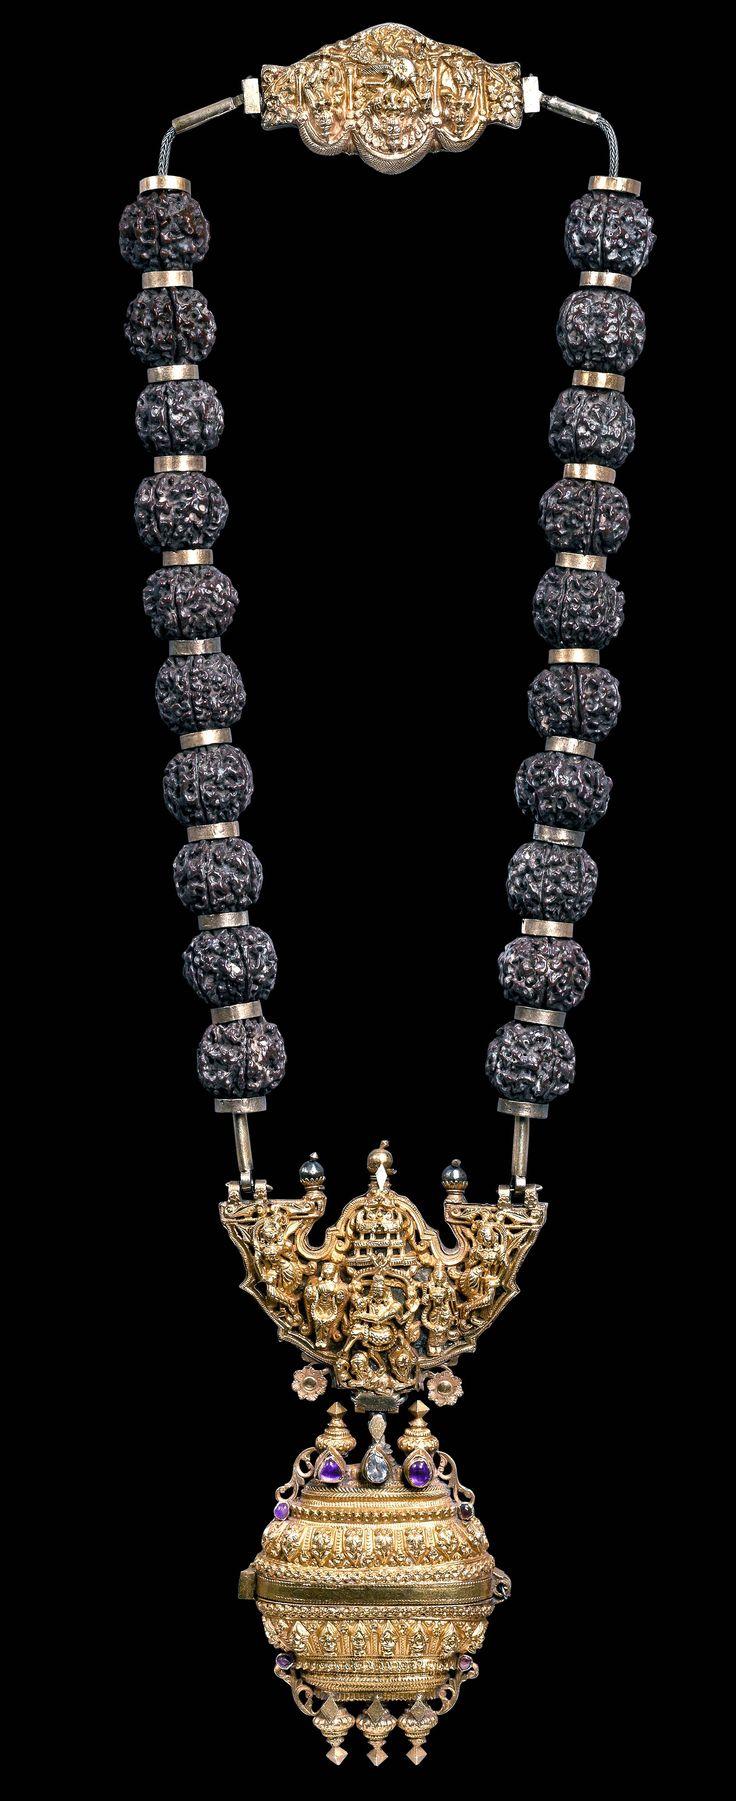 Gowrishankaram, 22 gold neck, rudraksha rubies, 19th c (Archives Singkiang)